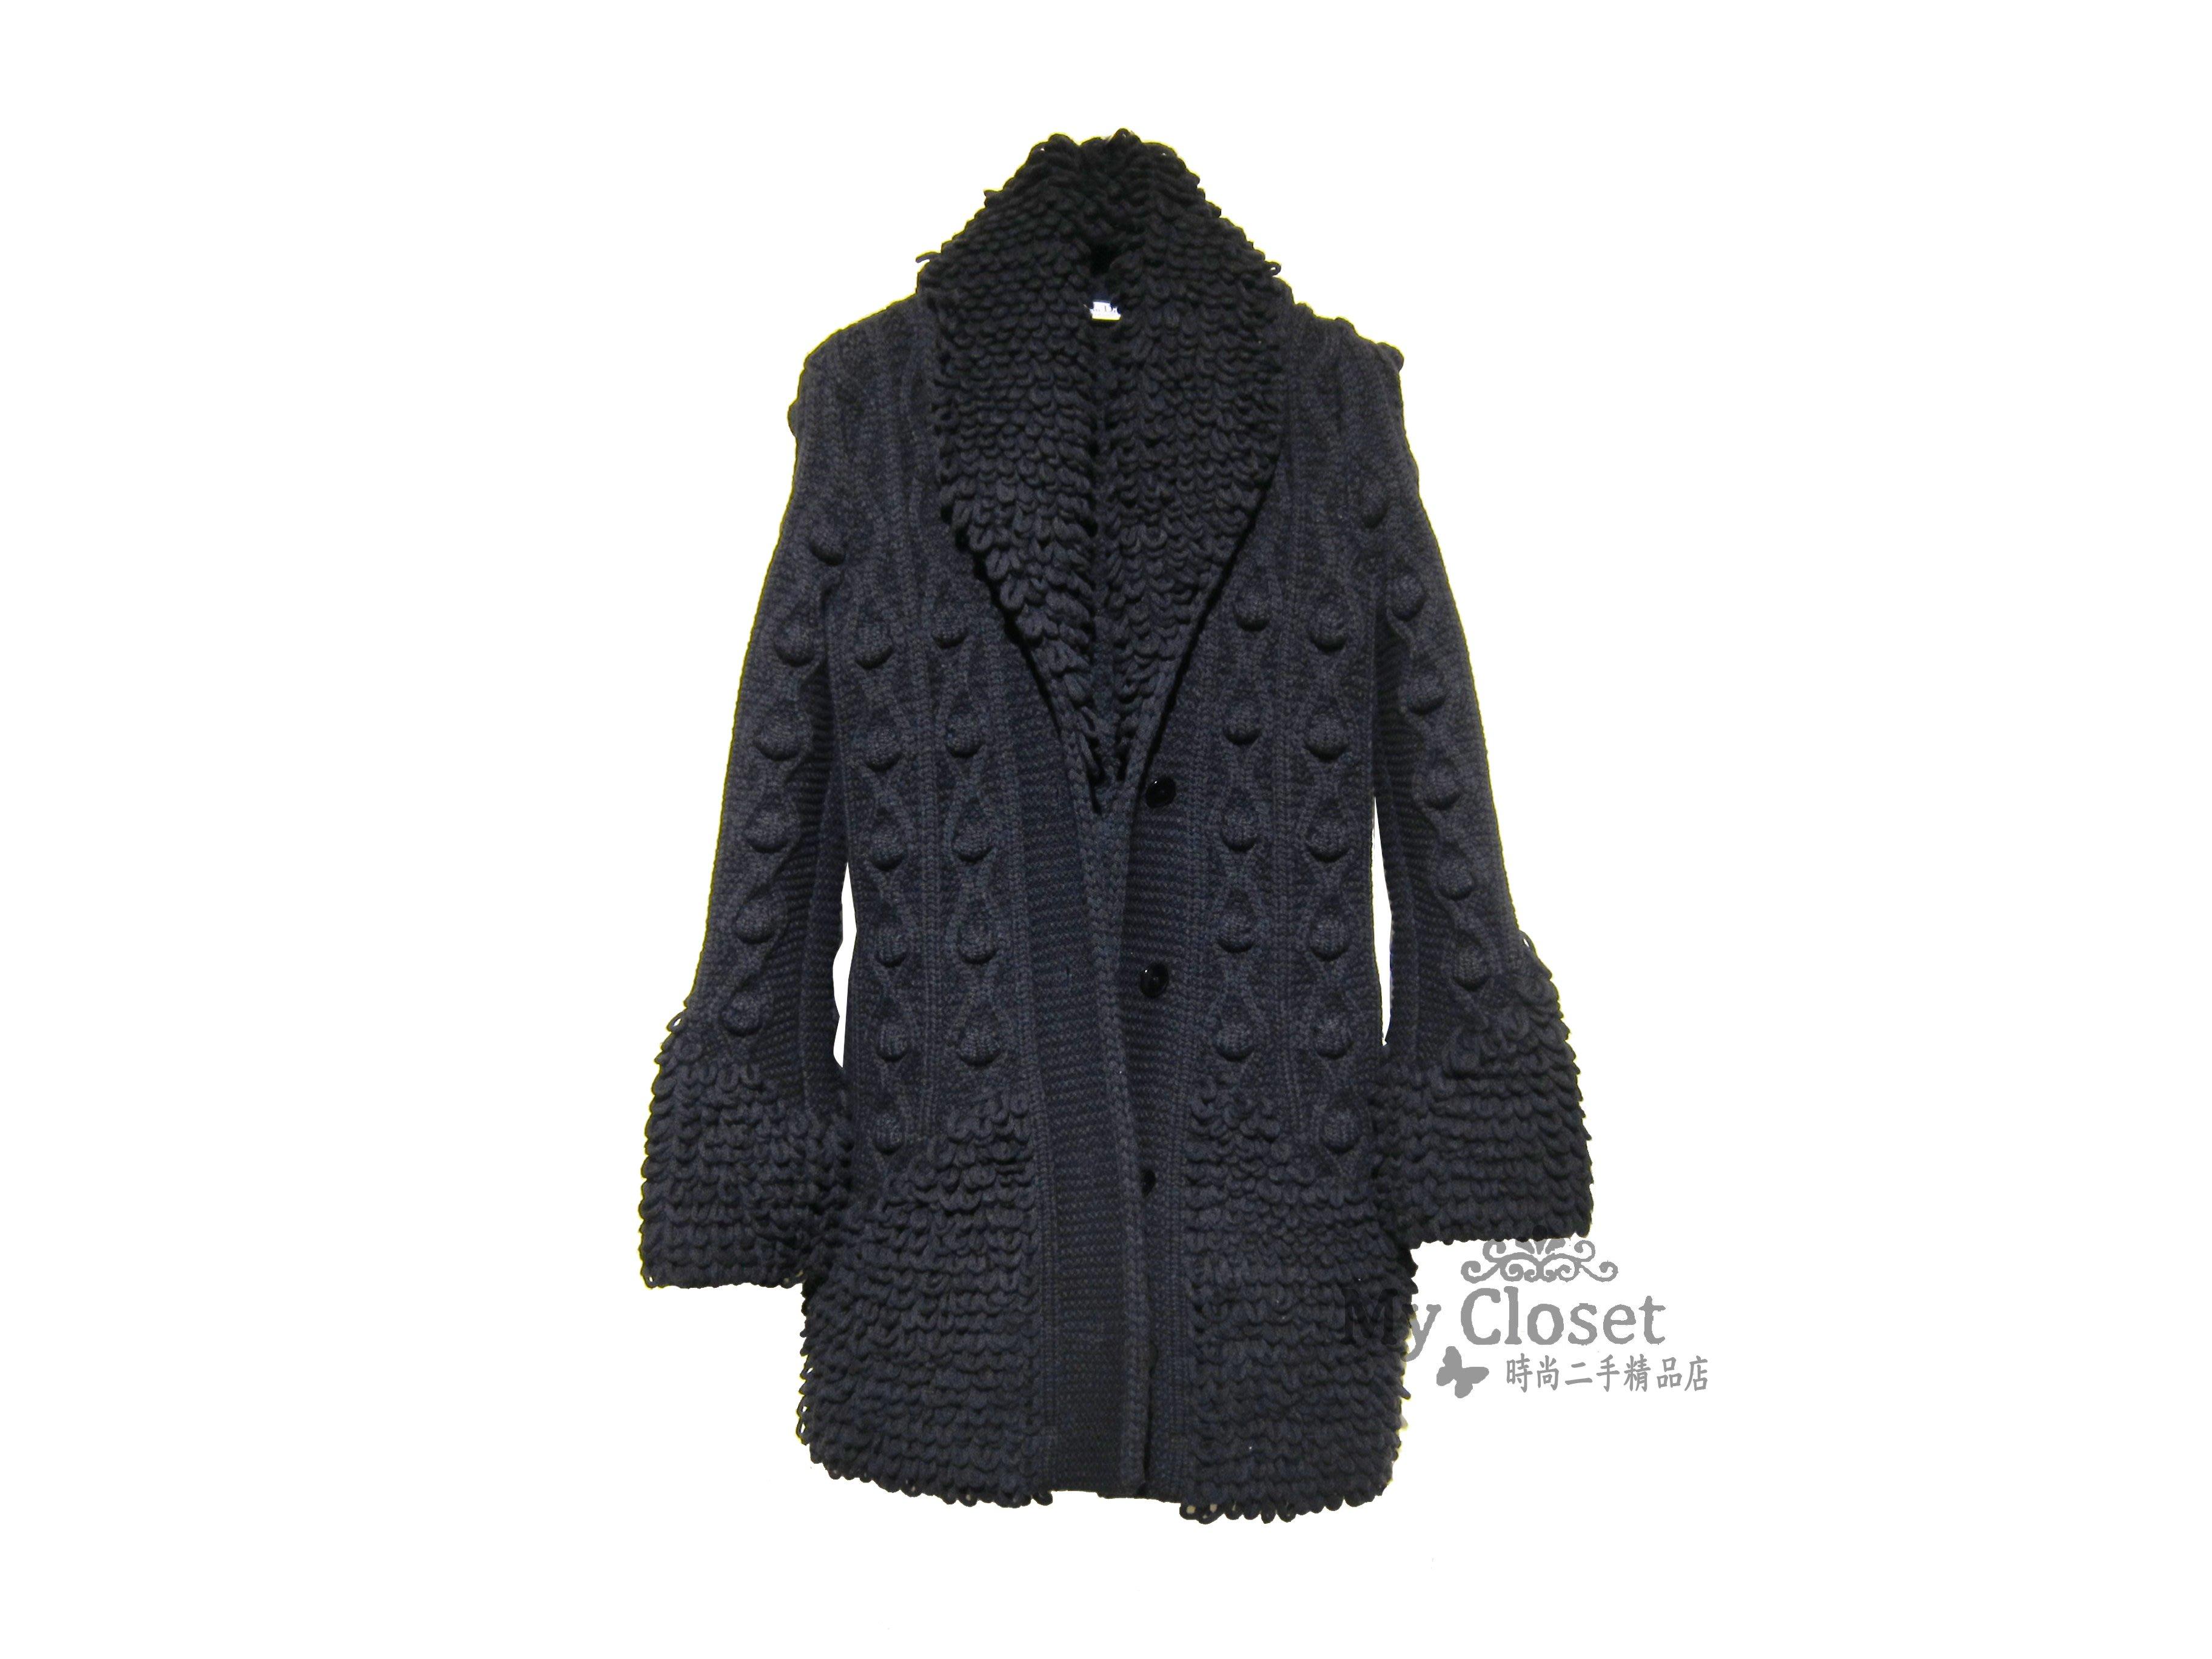 My Closet 二手名牌 Christian Dior 2017秋冬 黑色造型立體針織 厚織長外套